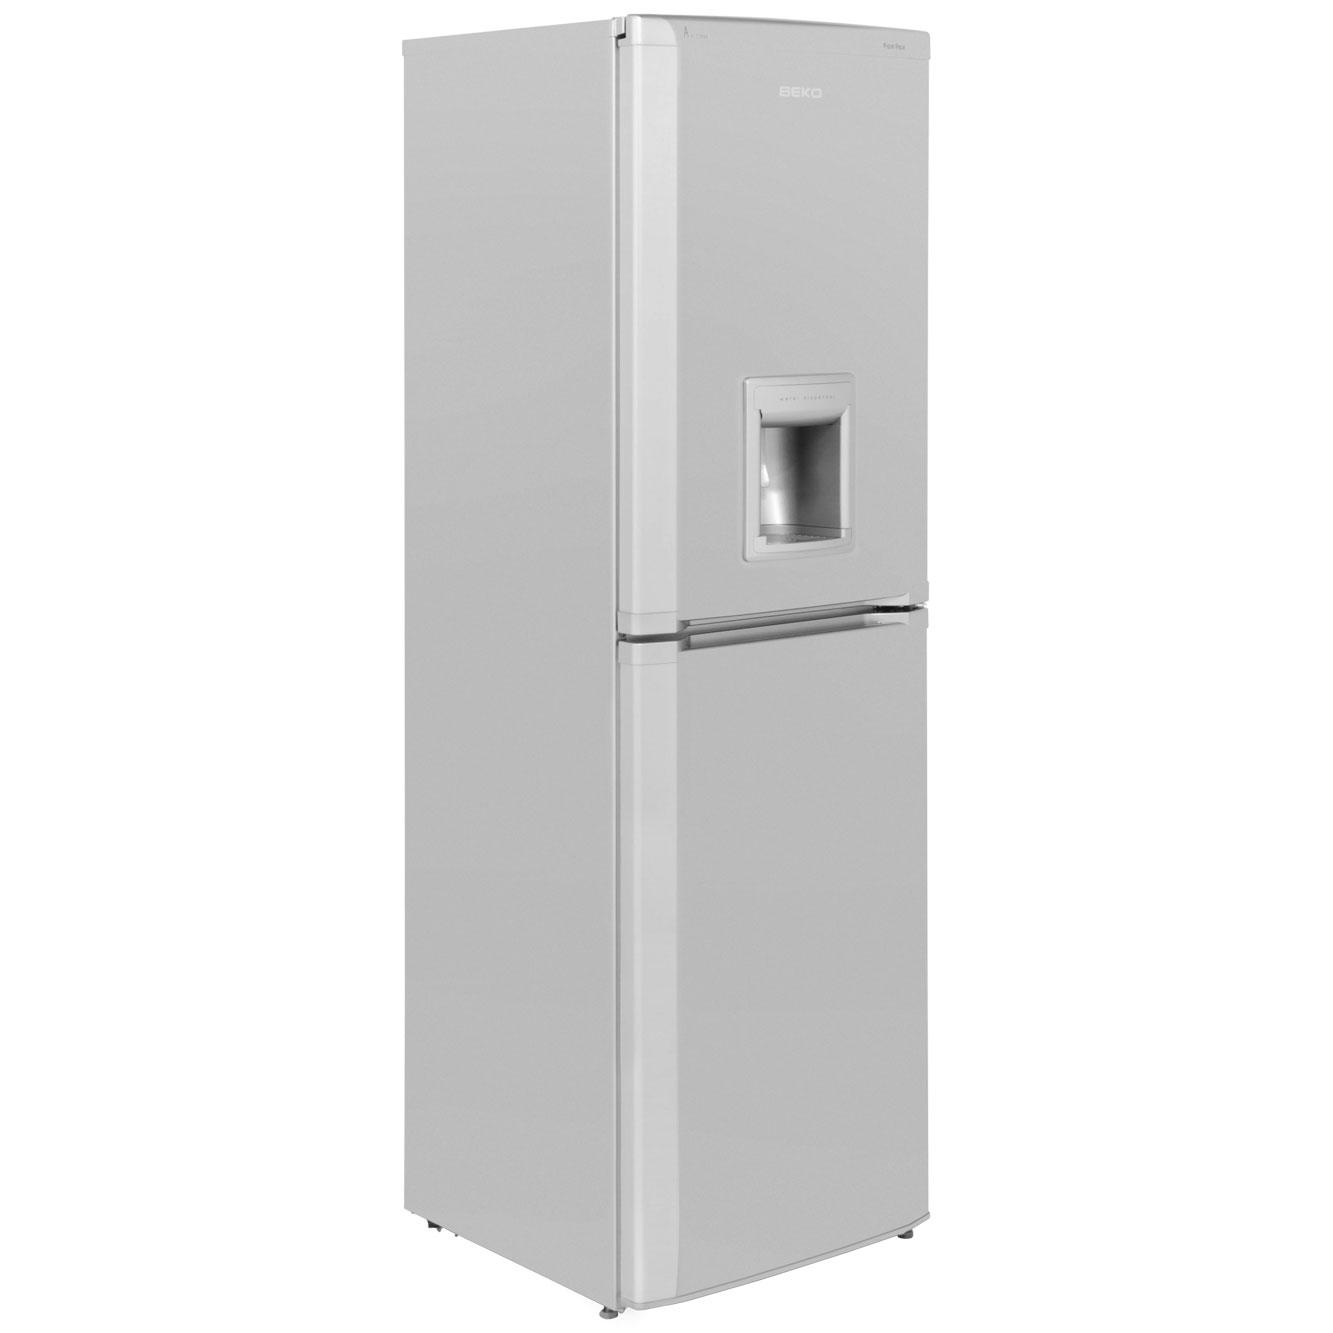 Slimline frost free fridge freezer